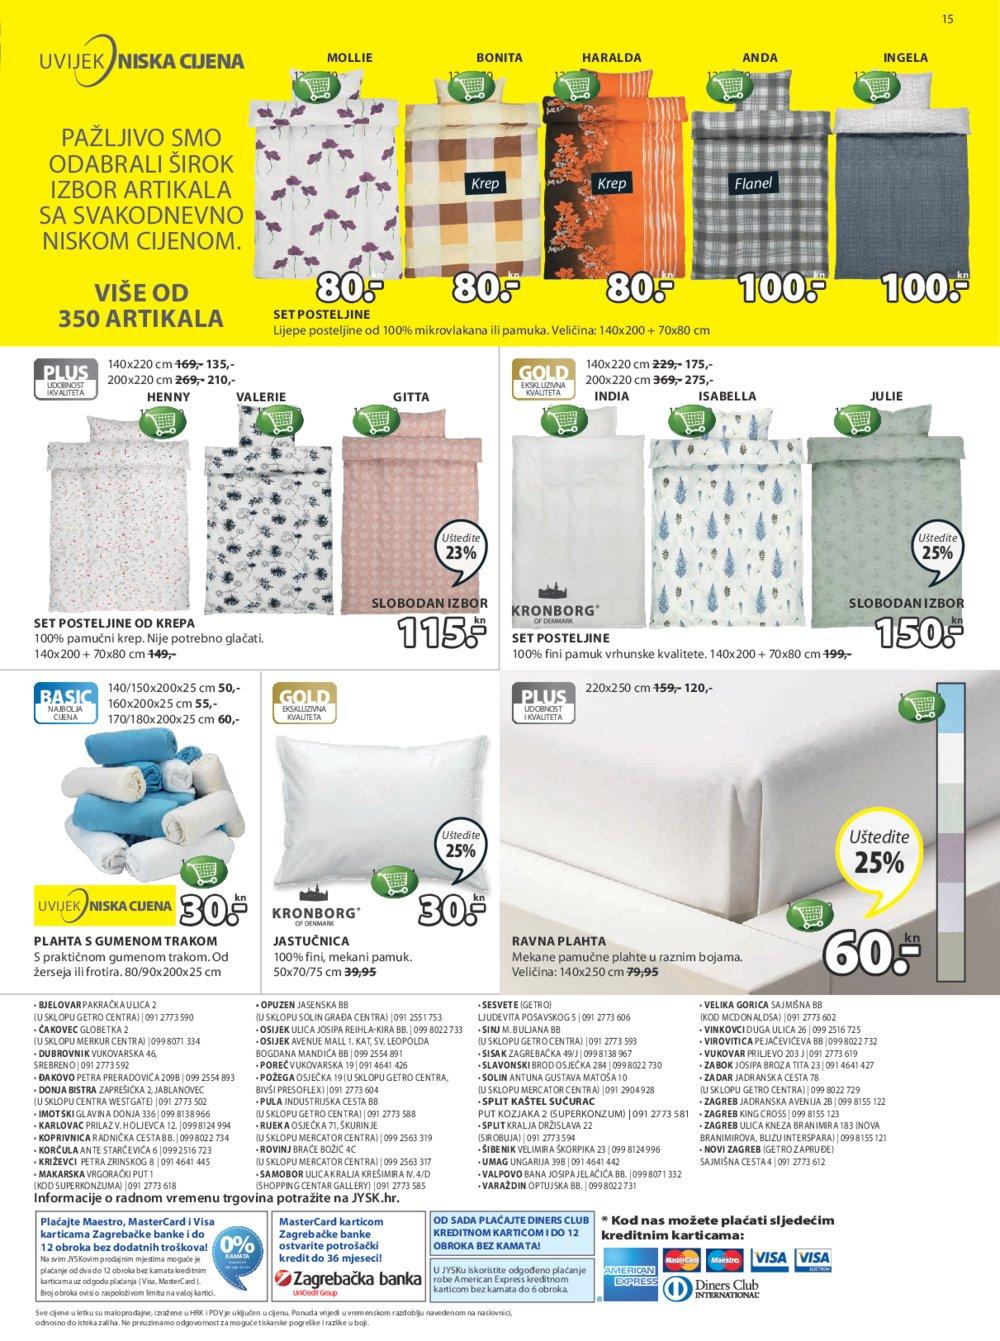 Jysk katalog Rasprodaja i ostale izvrsne ponude 06.07.-19.7.2017.